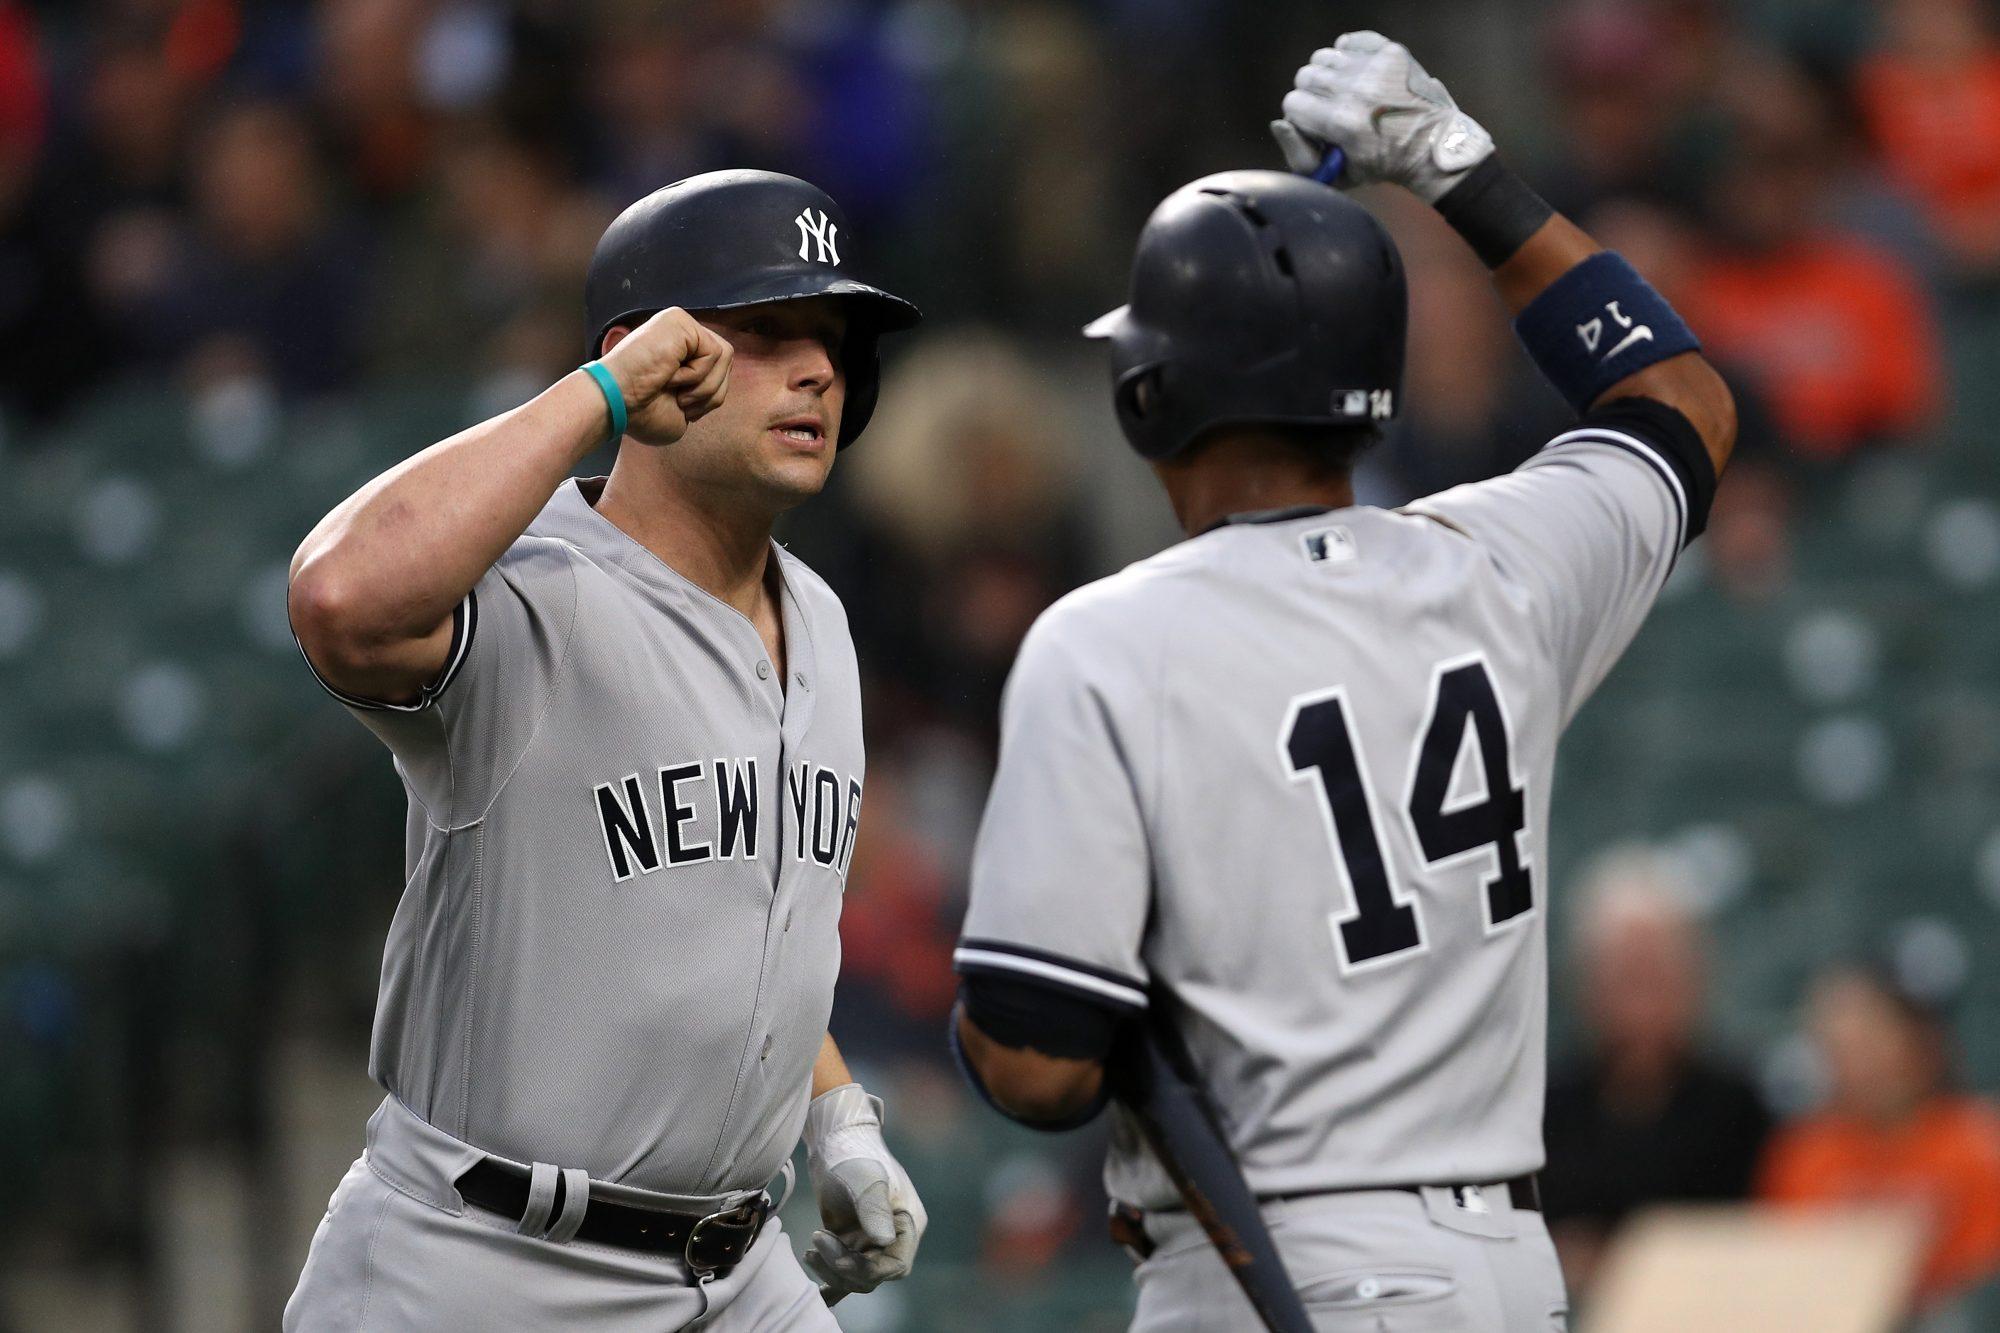 New York Yankees Bomber Buzz 8/19/17: Rehabbing Reinforcements Nearly Ready